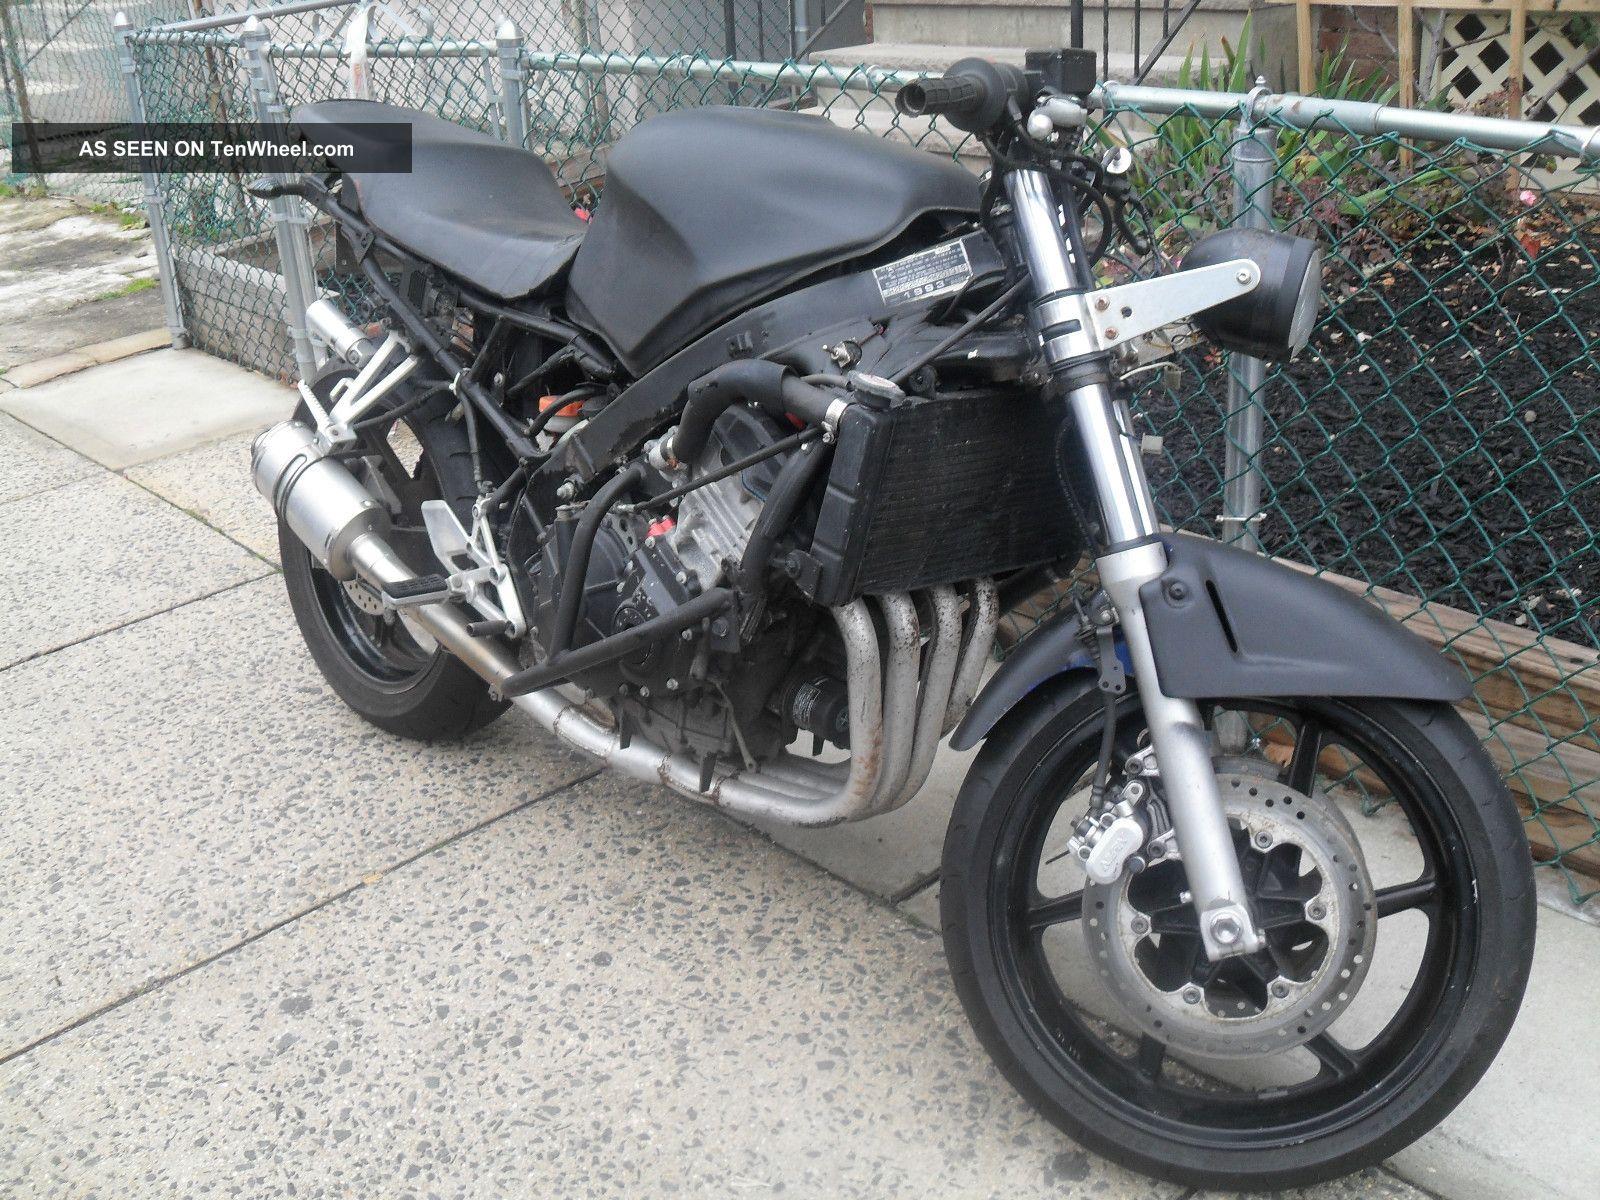 Honda Cbr600 F2 Stunt Bike Streetfighter With Title 2000 Or Make Offer